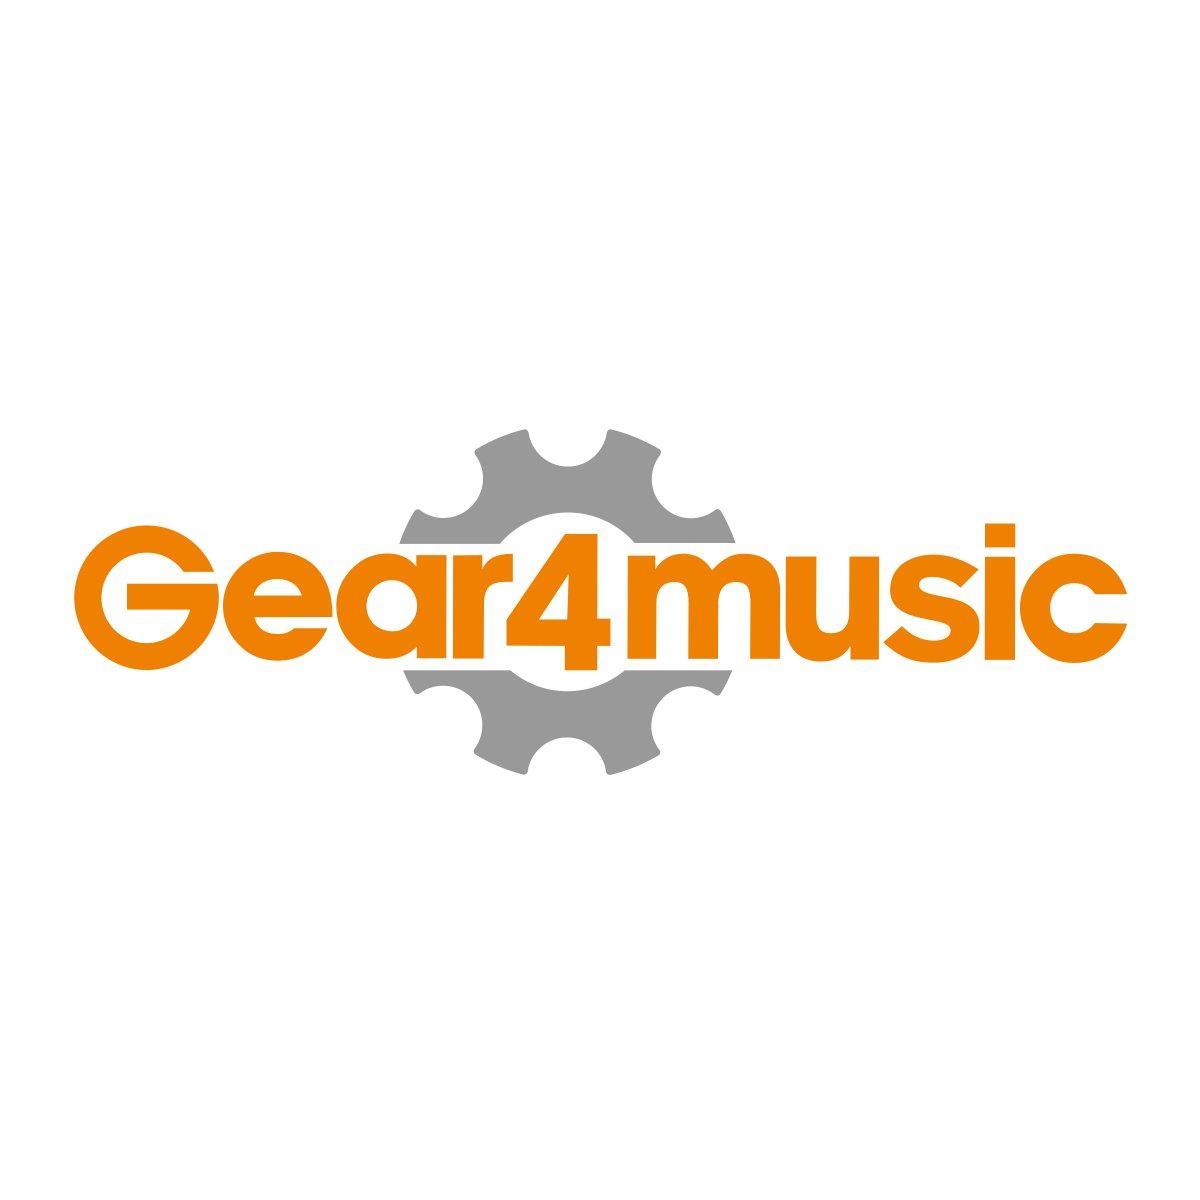 chicago bass guitar 15w amp pack trans red burst at gear4music. Black Bedroom Furniture Sets. Home Design Ideas